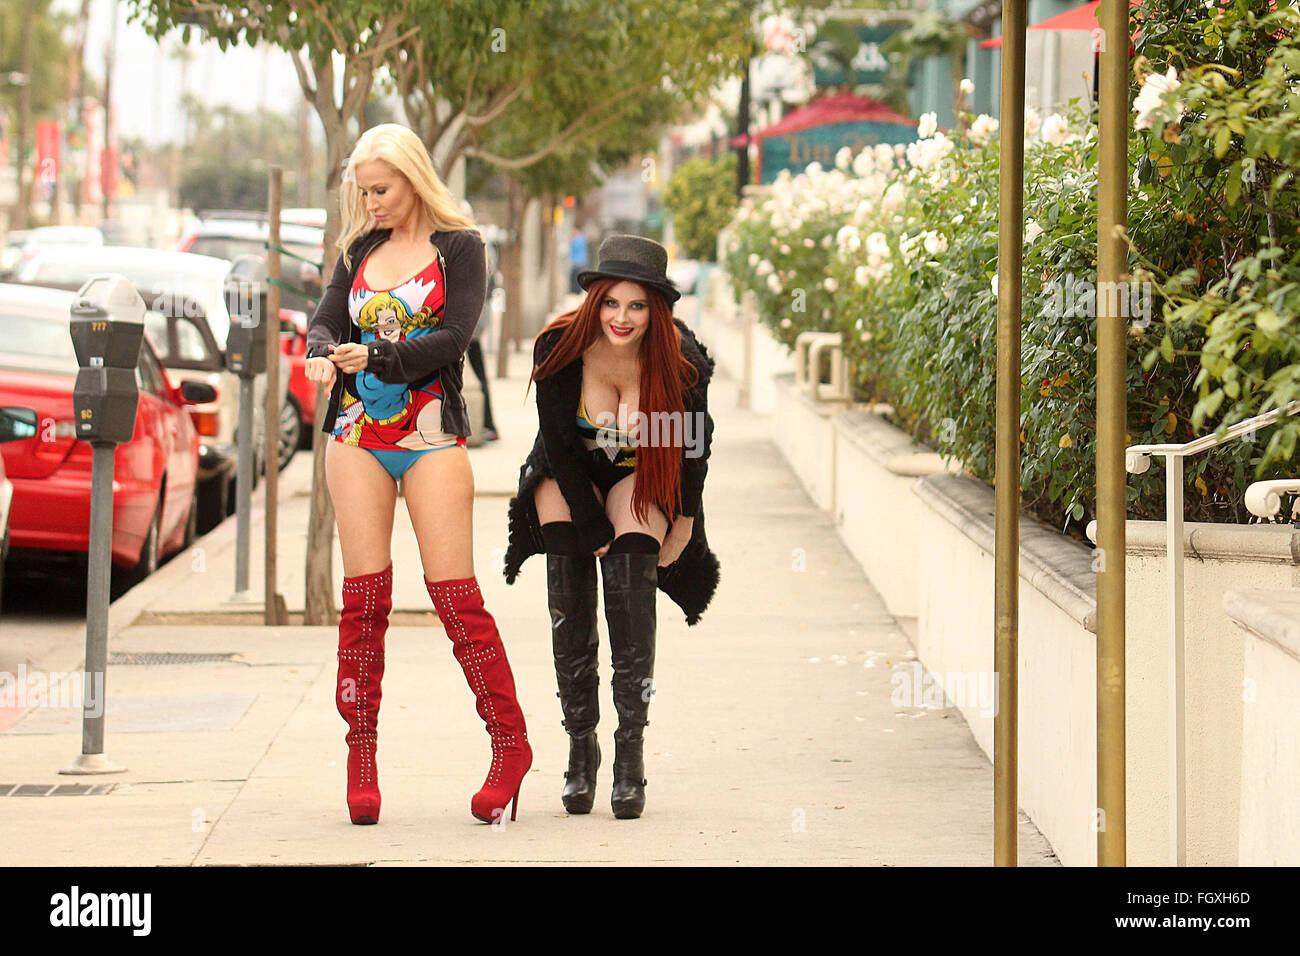 Phoebe Price And Ana Braga Street Sighting In Studio City